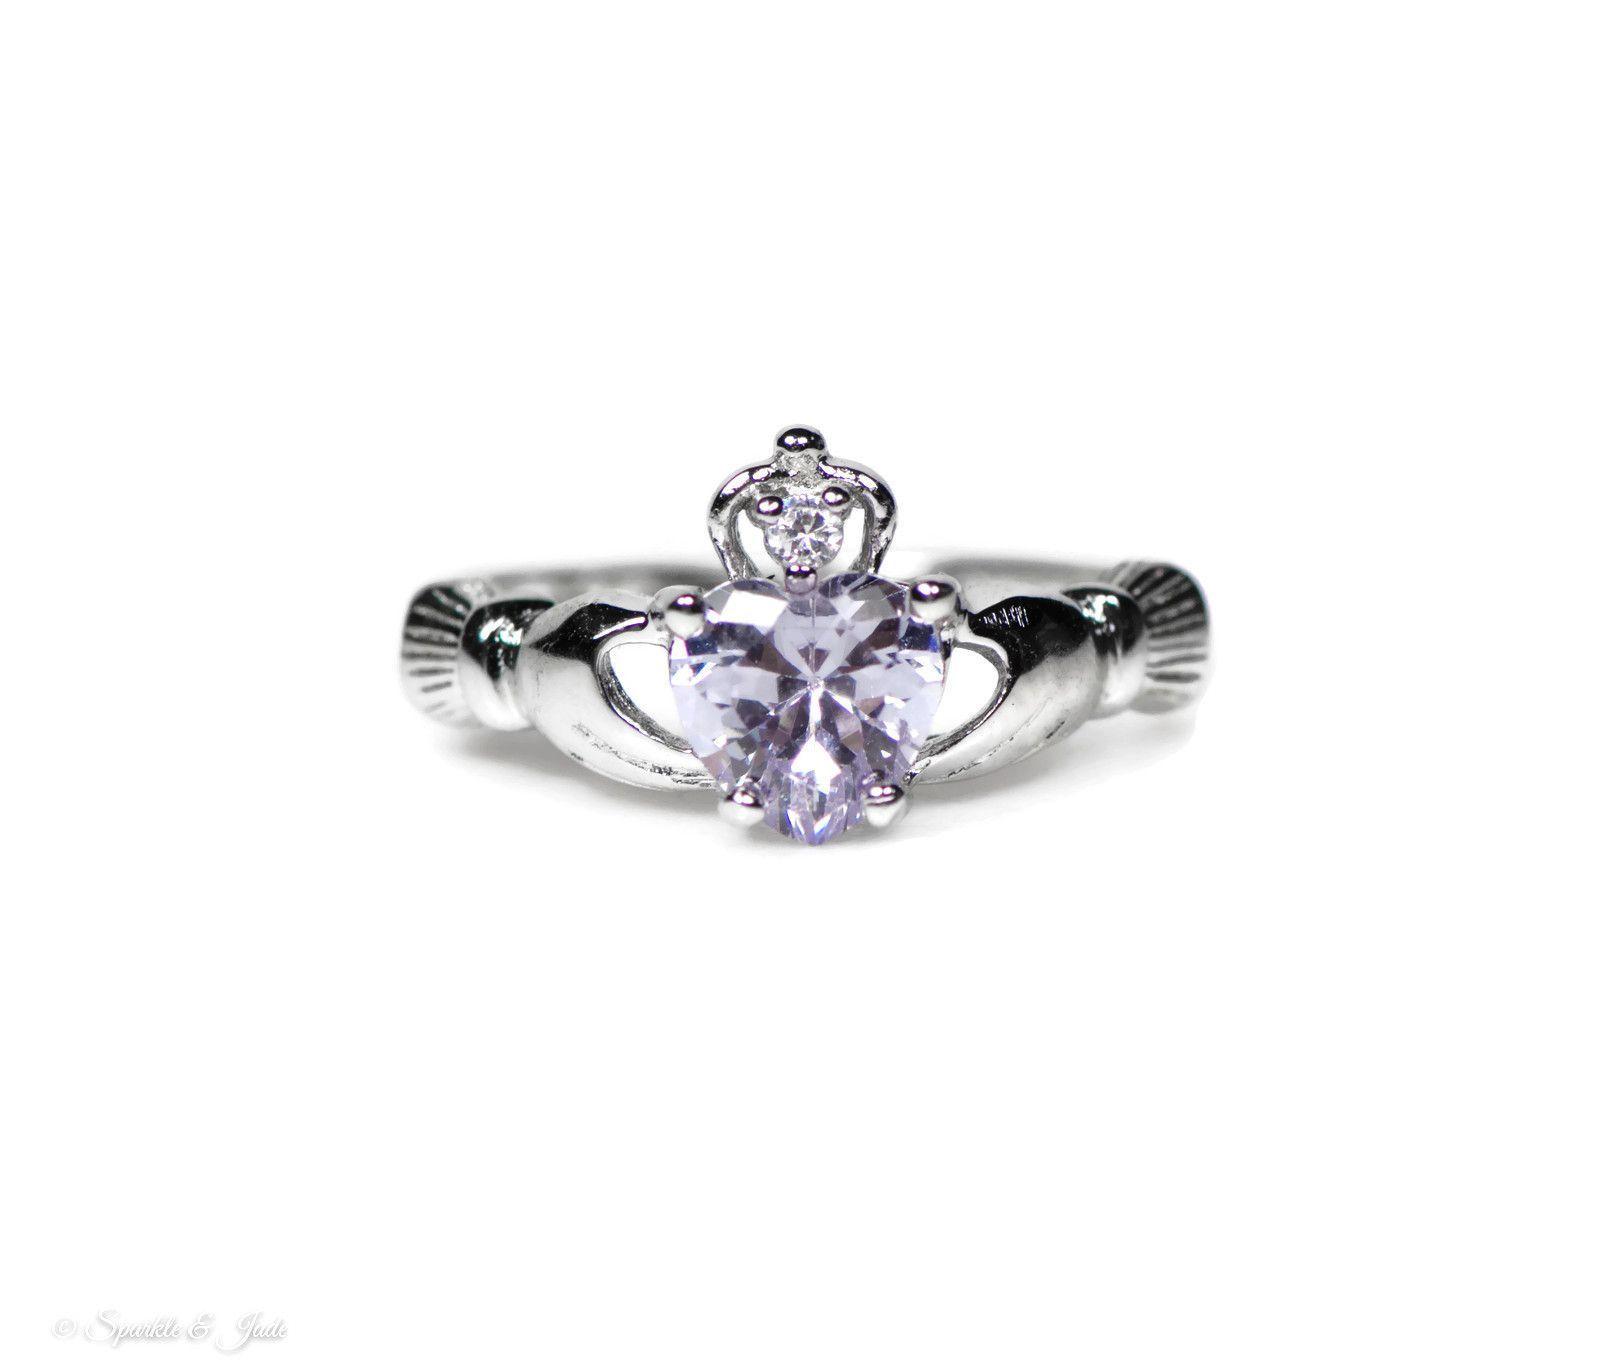 Sterling Silver & Moonstone June Birthstone Claddagh Ring Sizes I - U awuVjPq